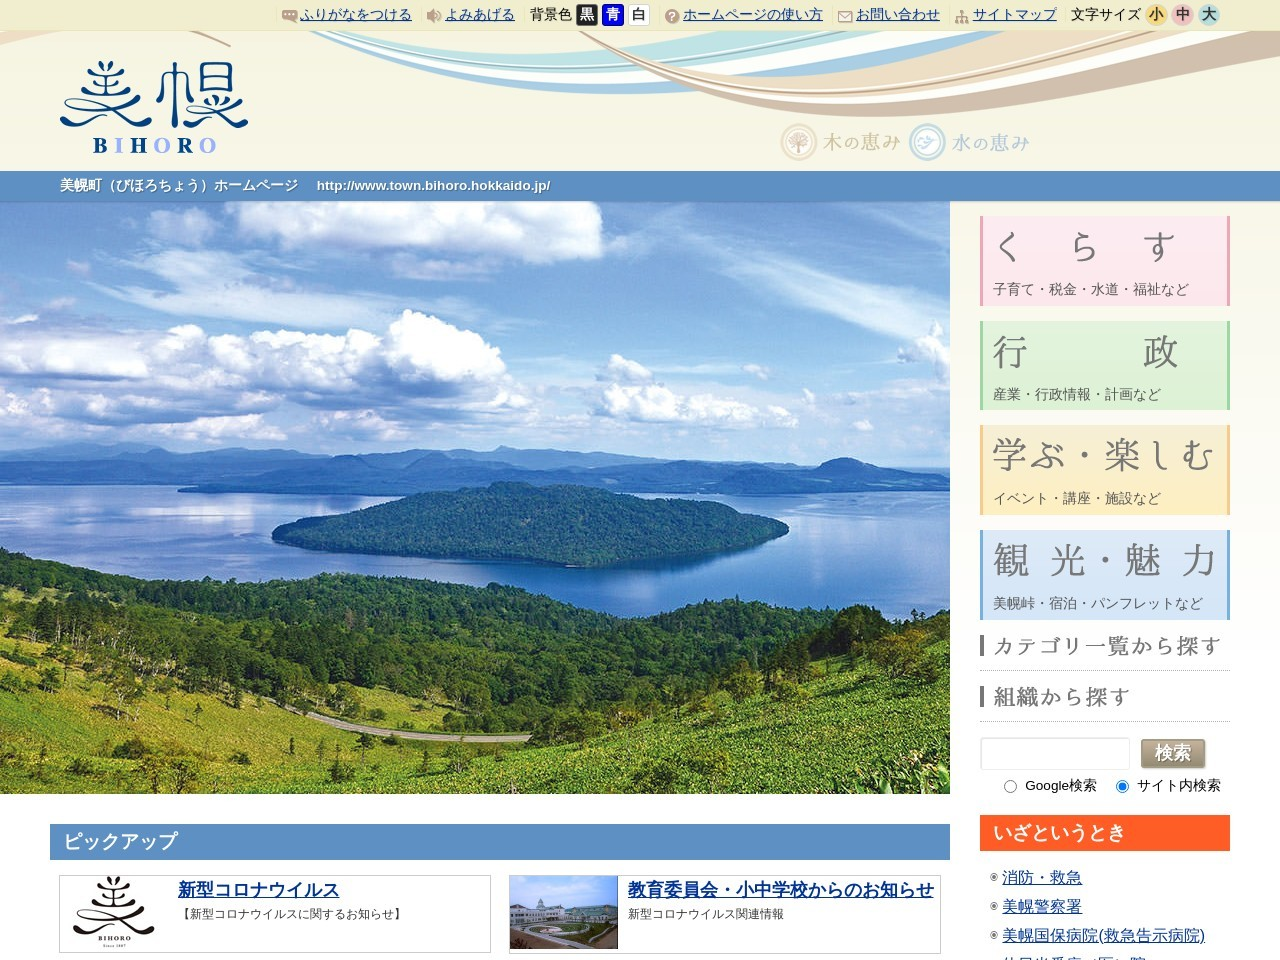 http://www.town.bihoro.hokkaido.jp/docs/2018120700012/